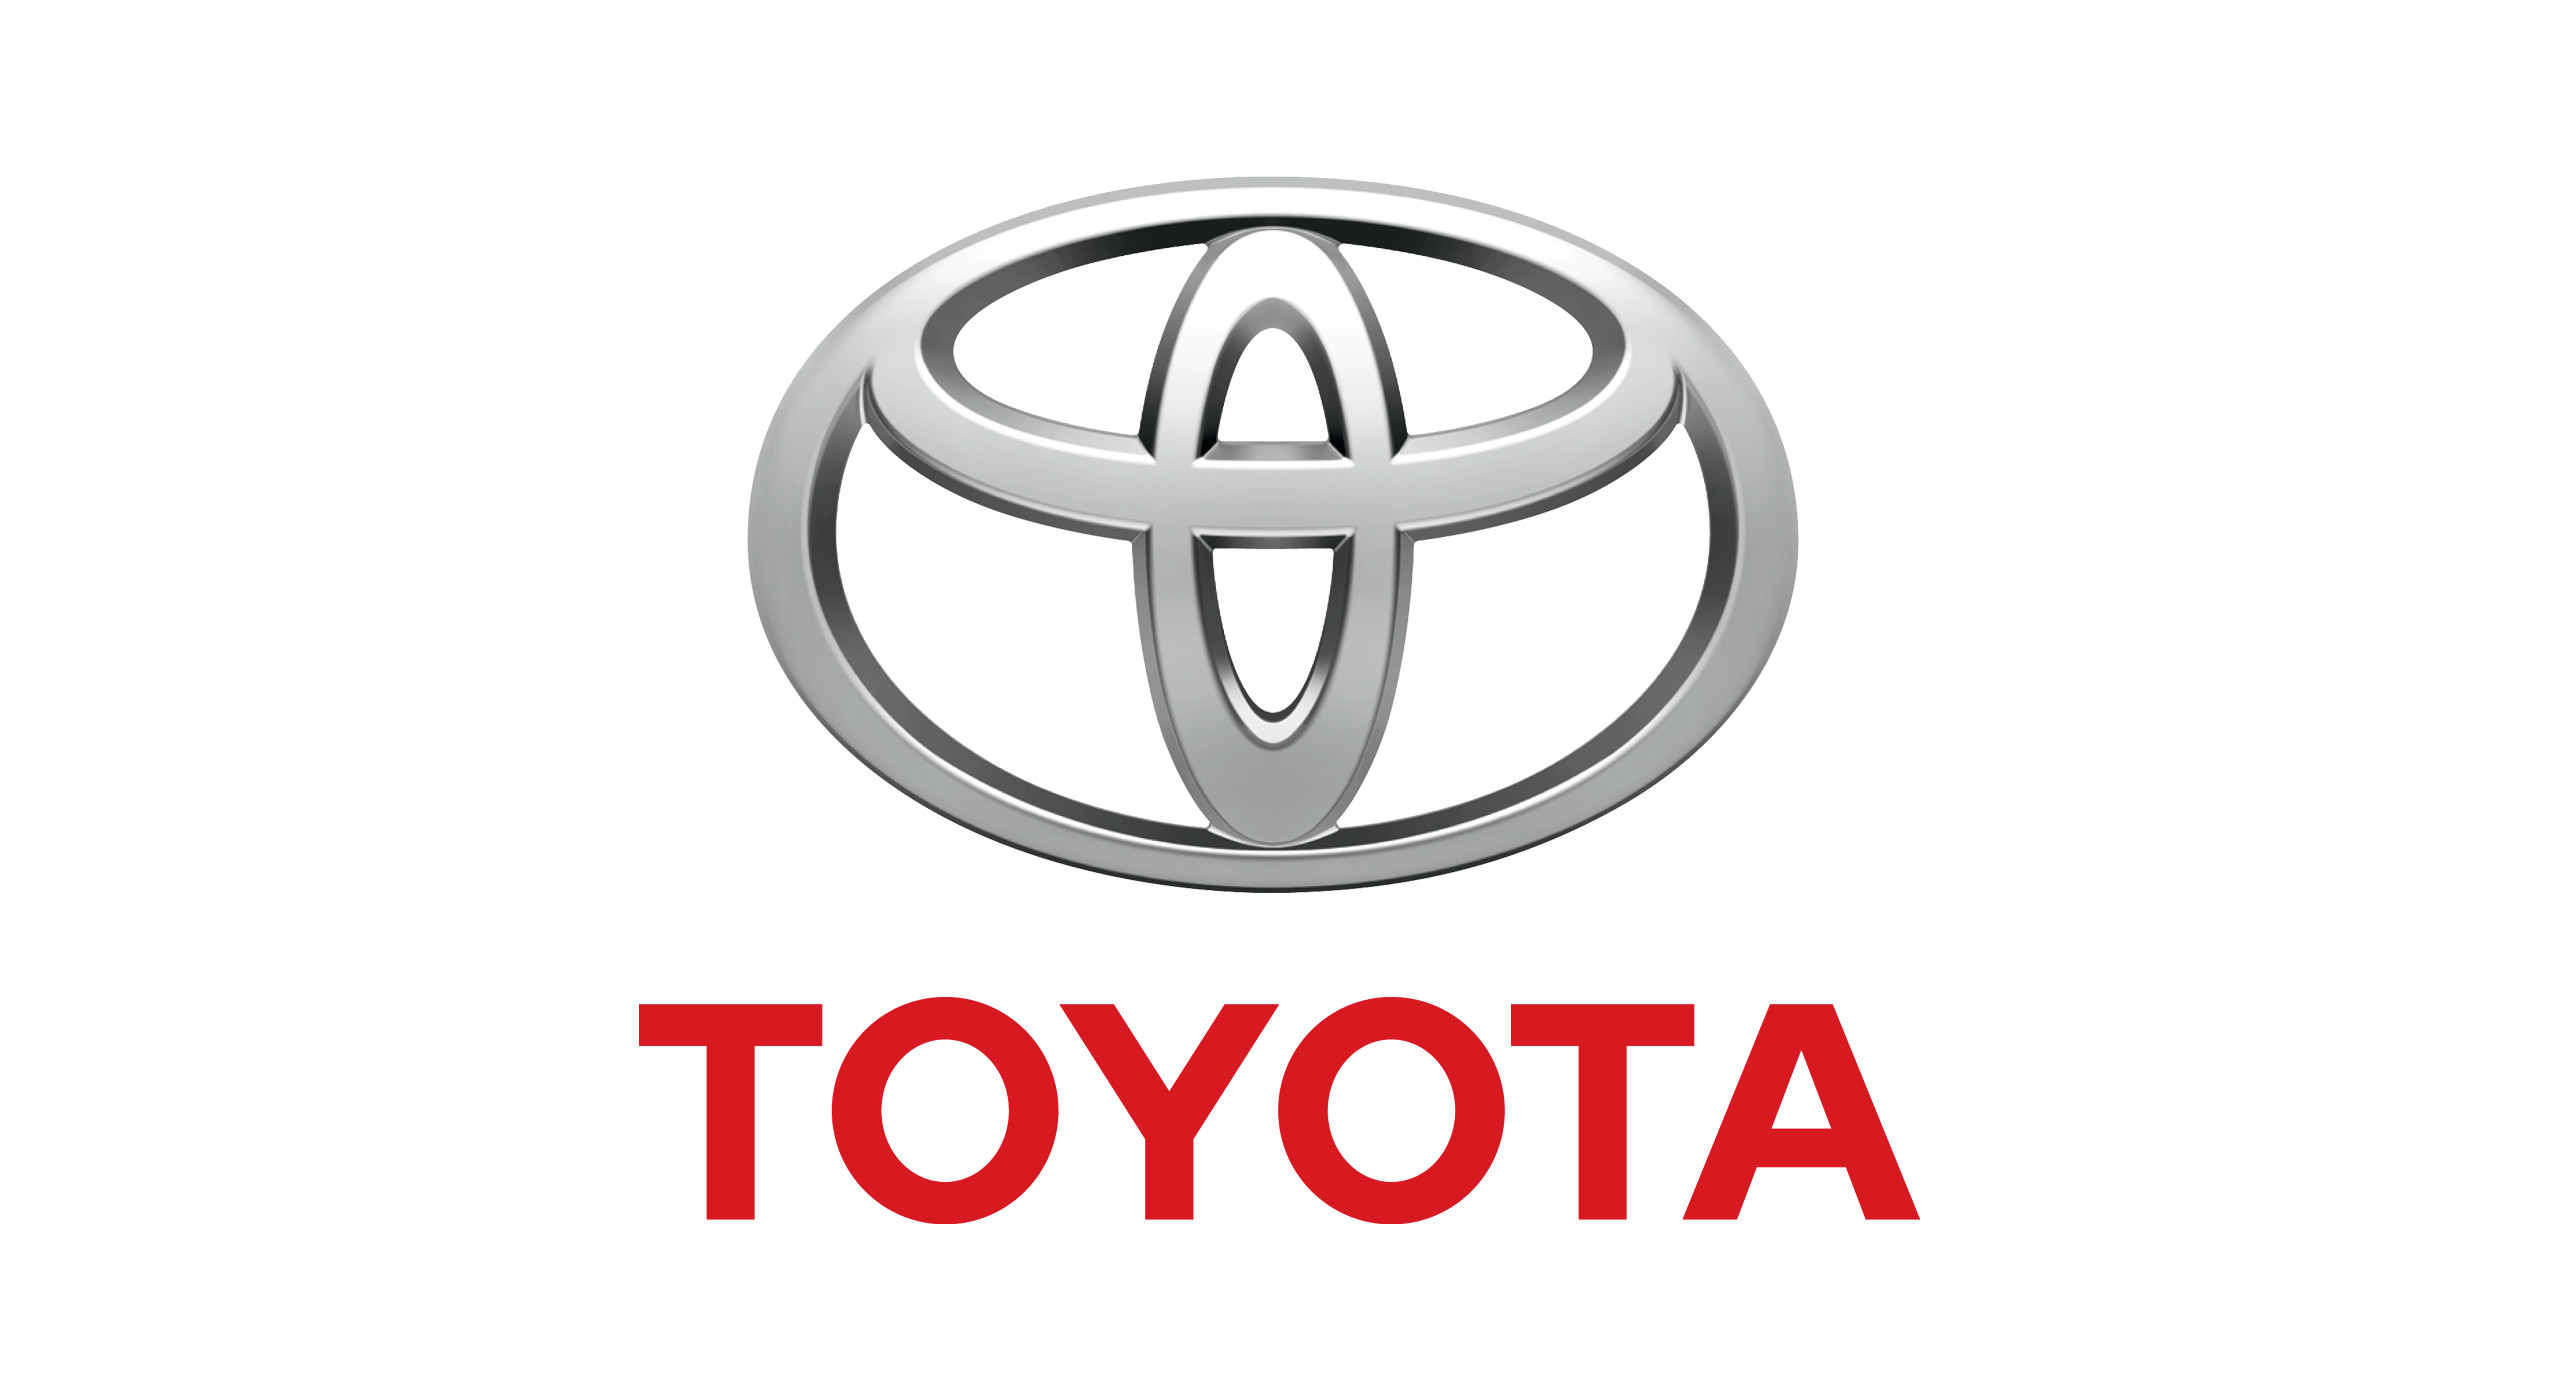 Toyota Logo (1989-Present) 2560×1440 HD png